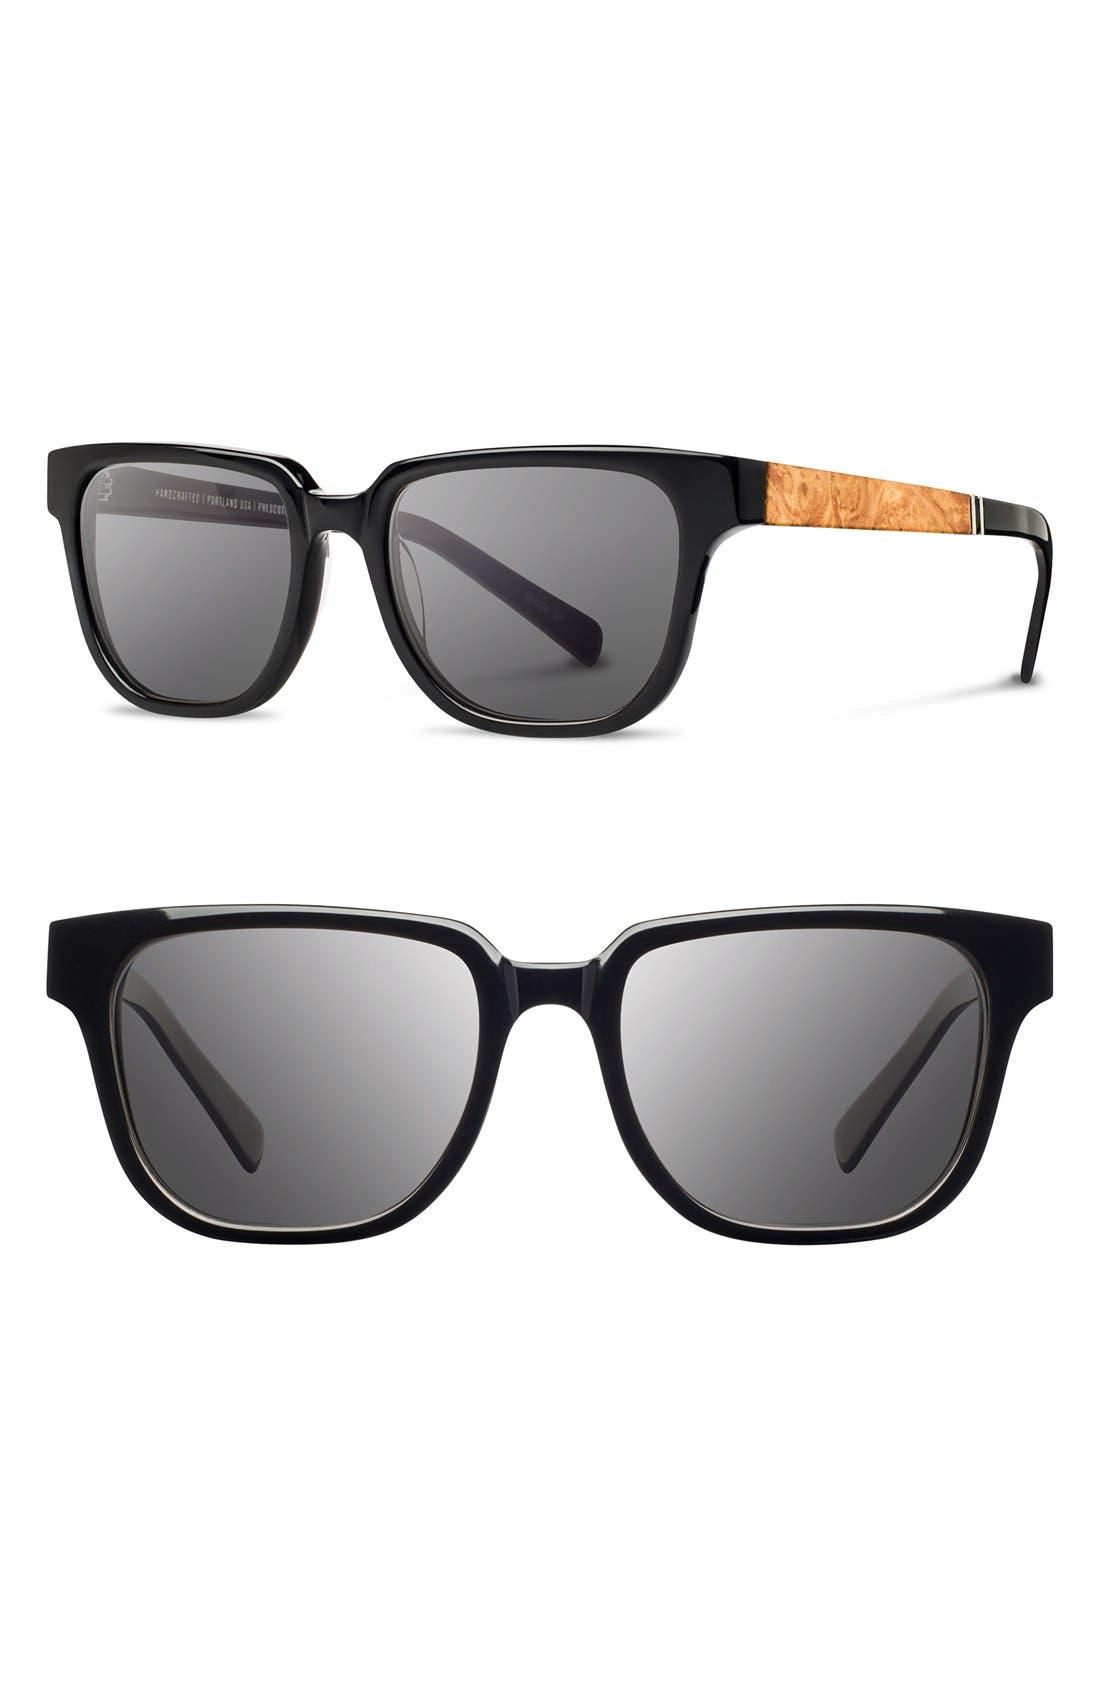 'Prescott' 52mm Polarized Acetate & Wood Sunglasses,                             Main thumbnail 1, color,                             001